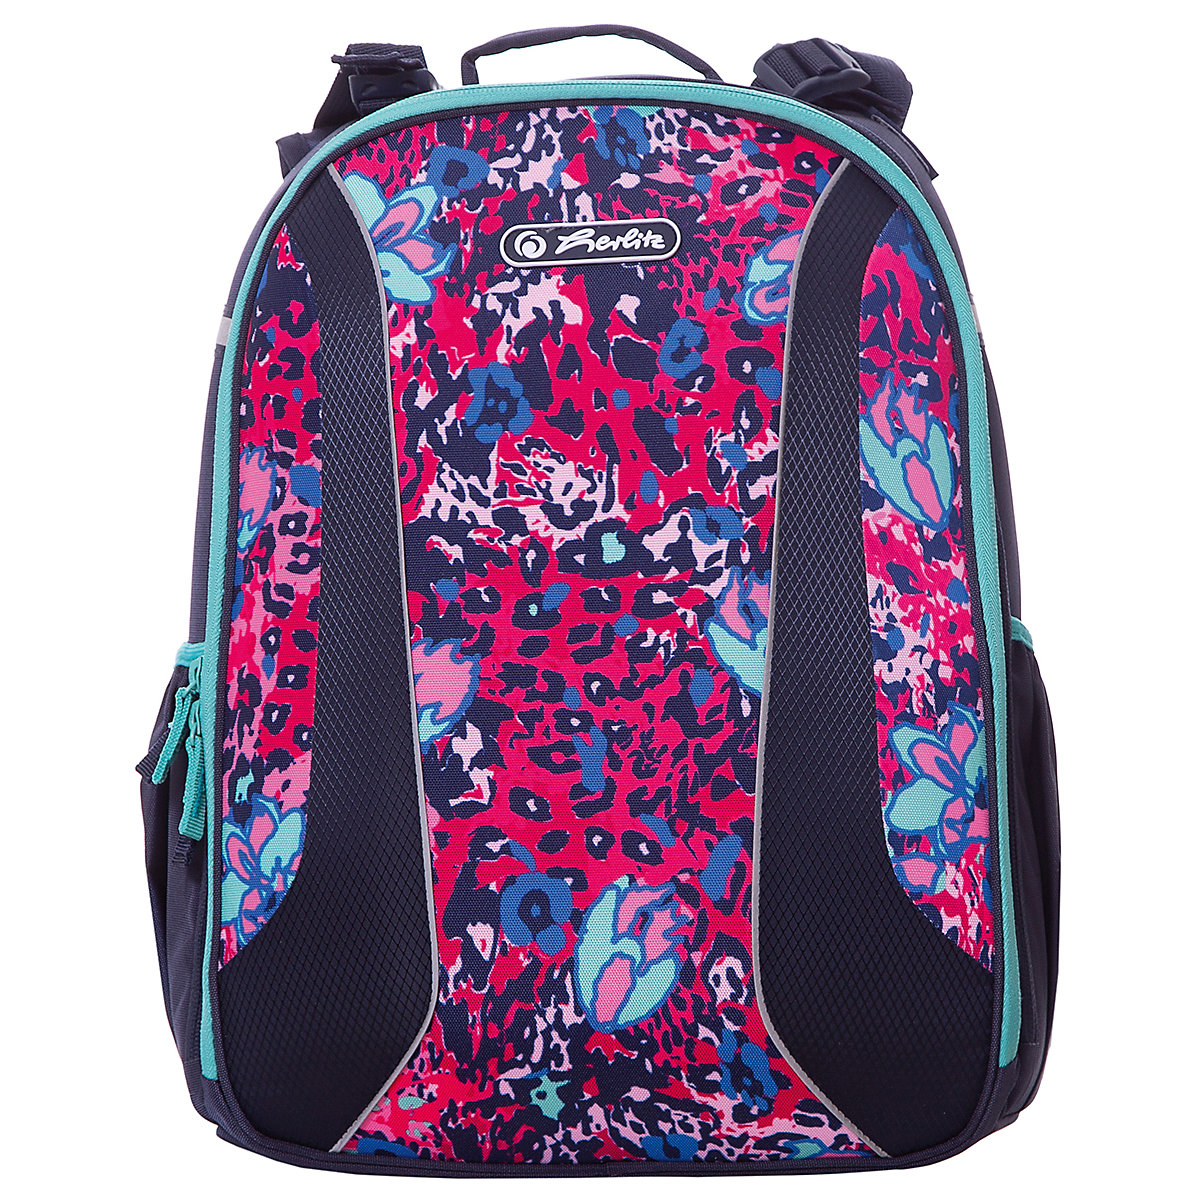 School Bags HERLITZ 7936485 schoolbag backpack orthopedic bag for boy and girl animals flowers imido brand designer backpack women genuine leather bag for girl schoolbag black sheepskin fashion rivet mochila feminina sld051